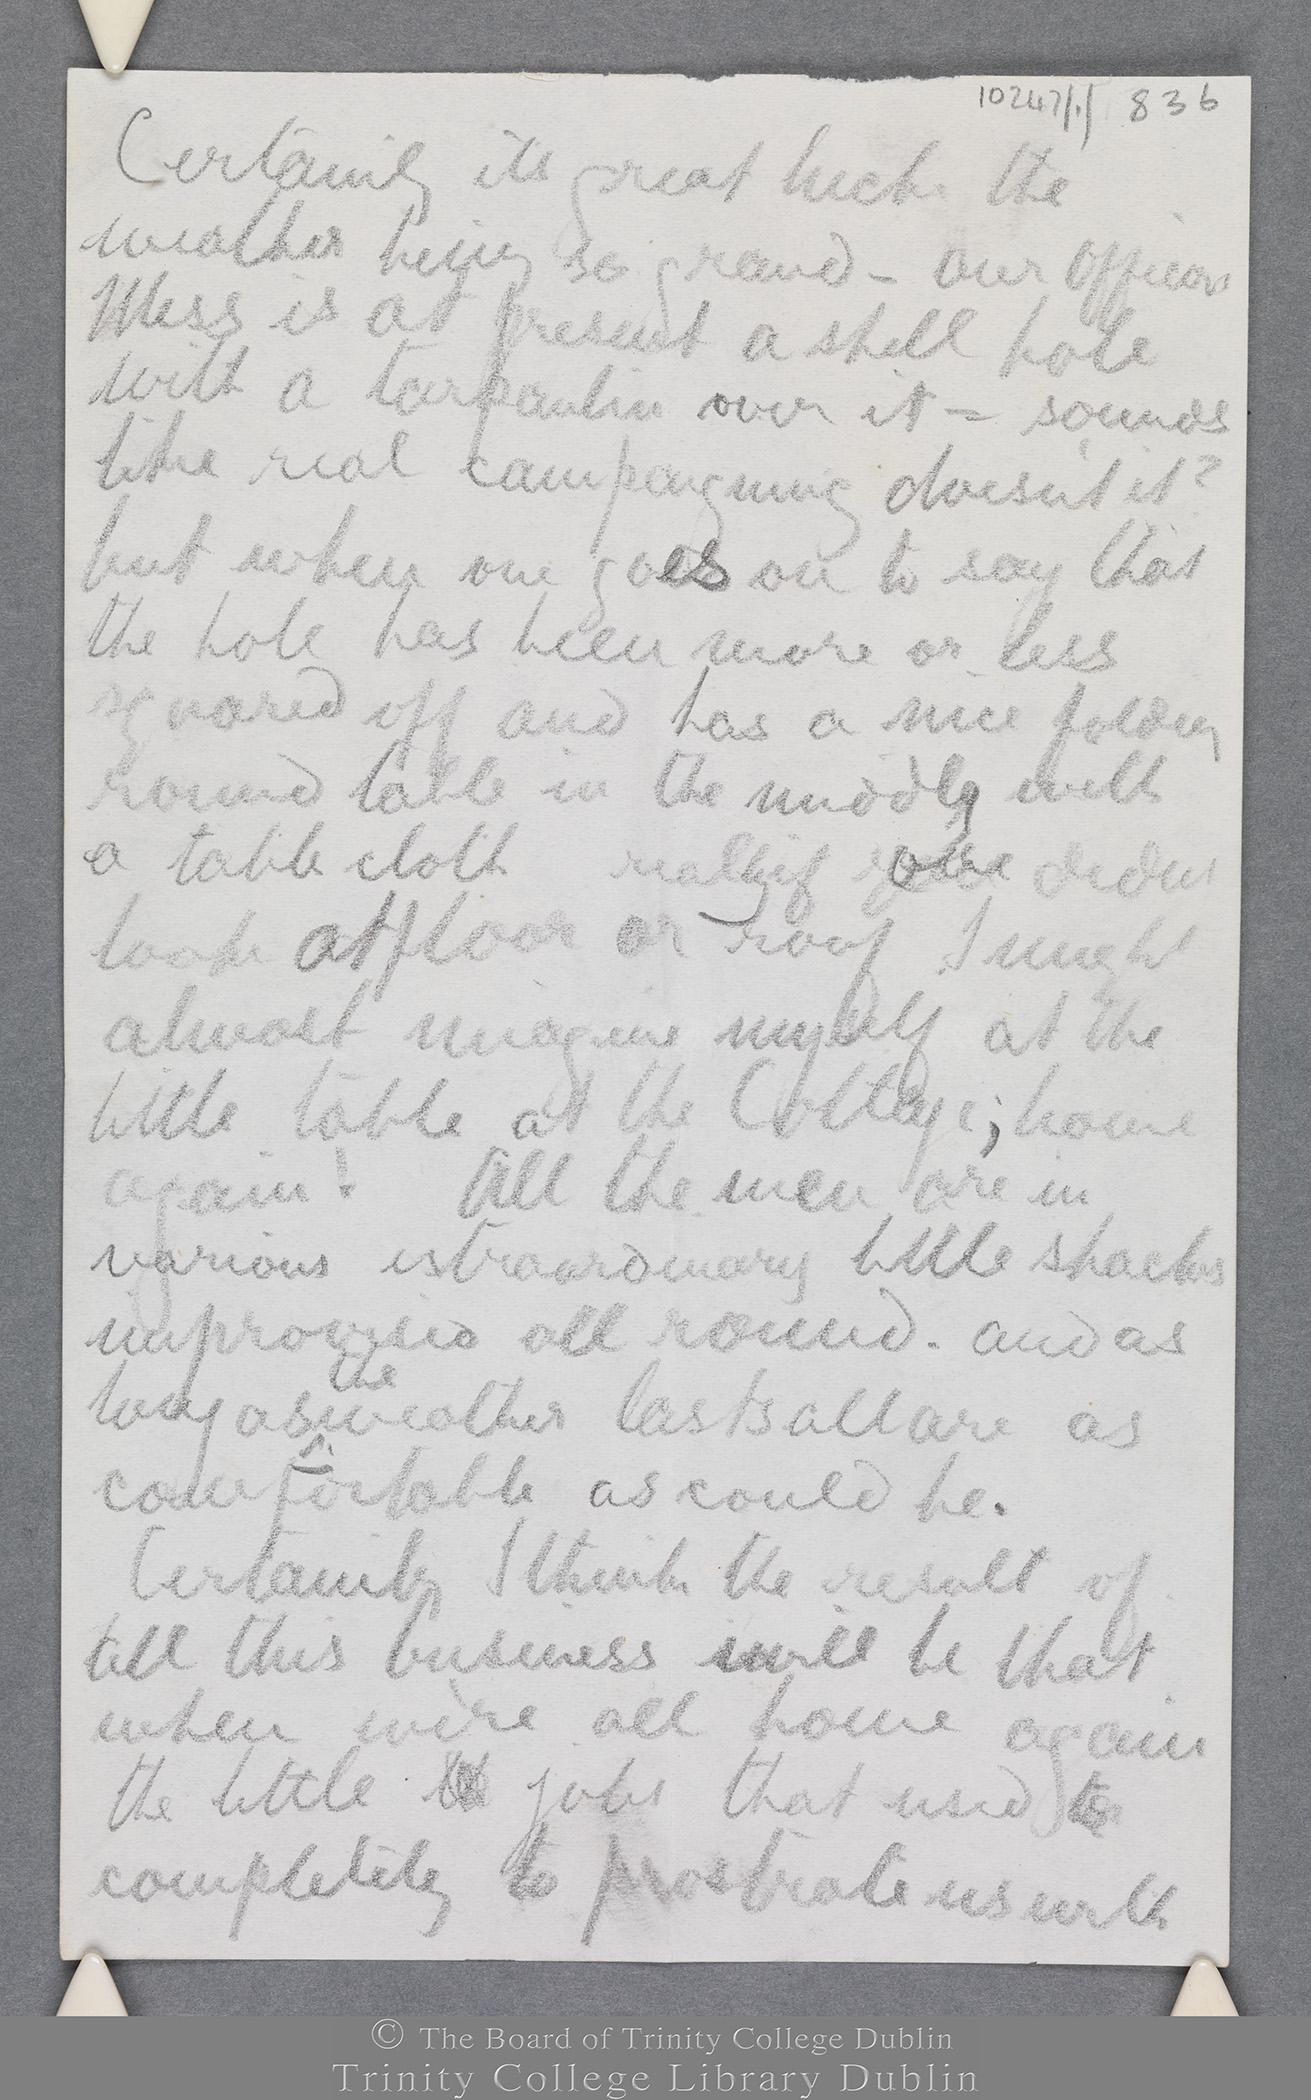 TCD MS 10247/1/836 folio 8 recto